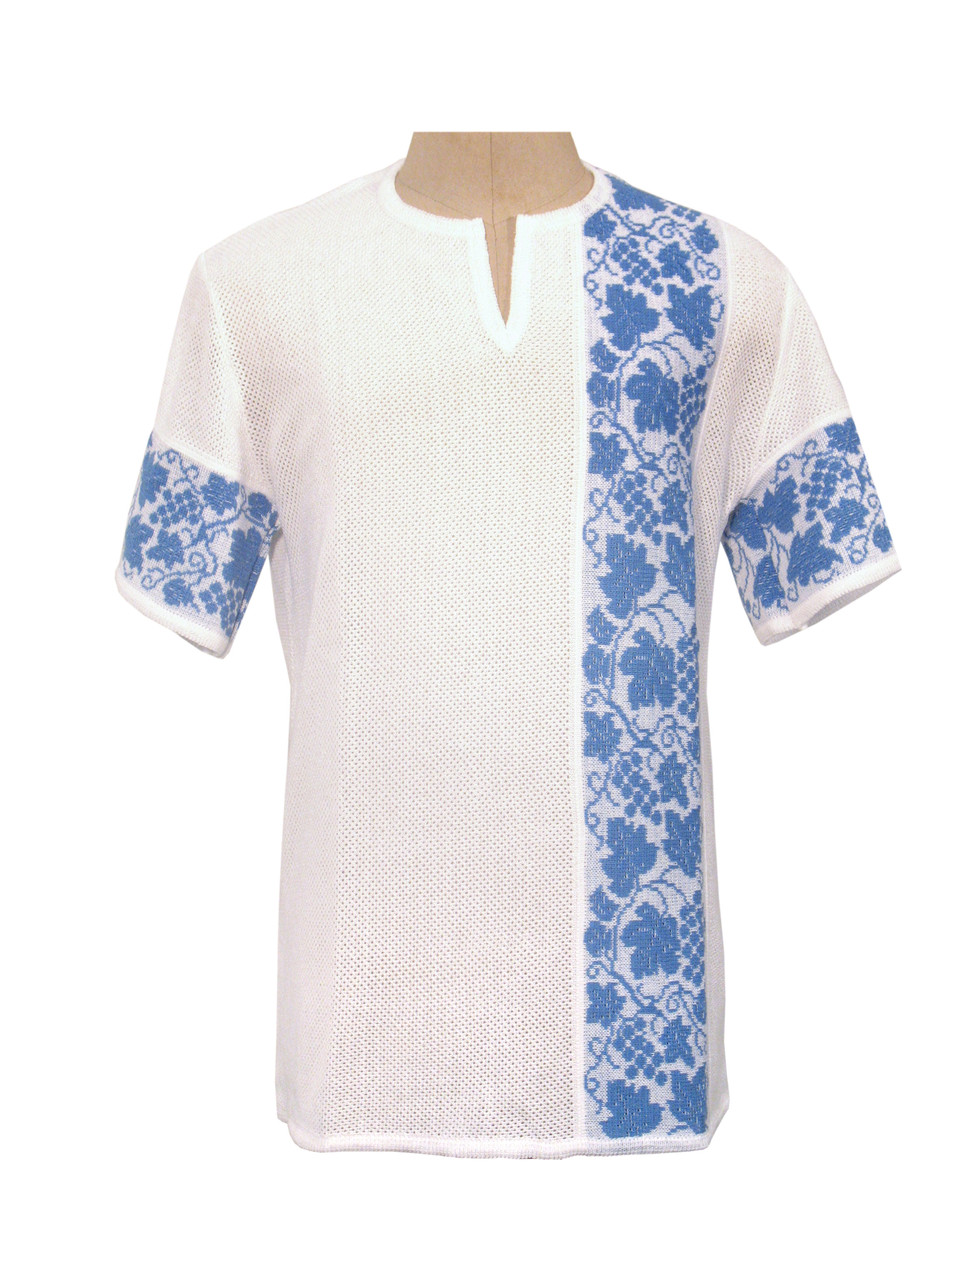 Мужская вязаная рубашка 20250 (короткий рукав)